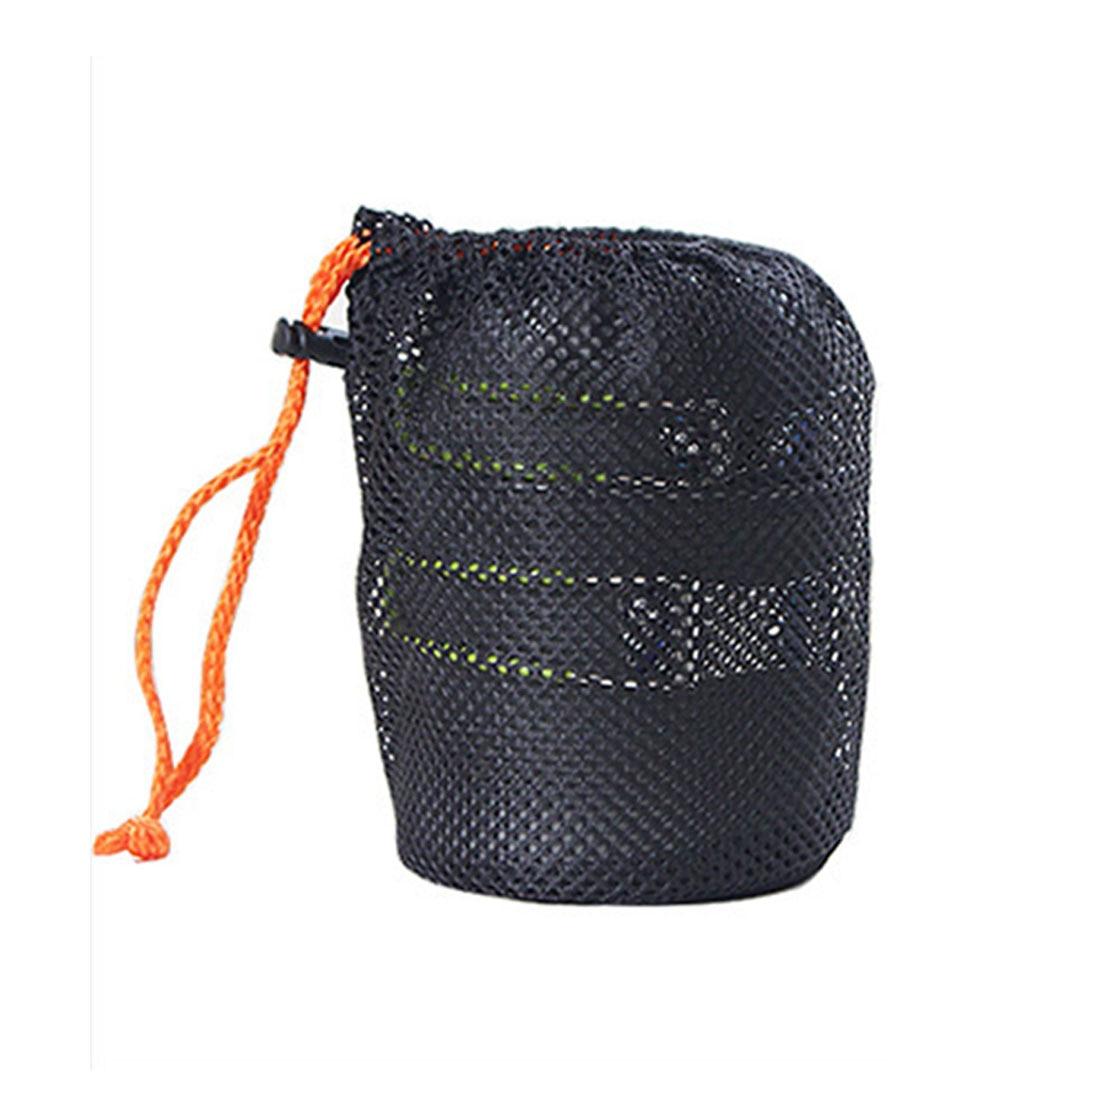 Pot Panci non-stick Mangkuk Portabel Outdoor Camping Hiking Memasak Set Peralatan Masak Kualitas Baik